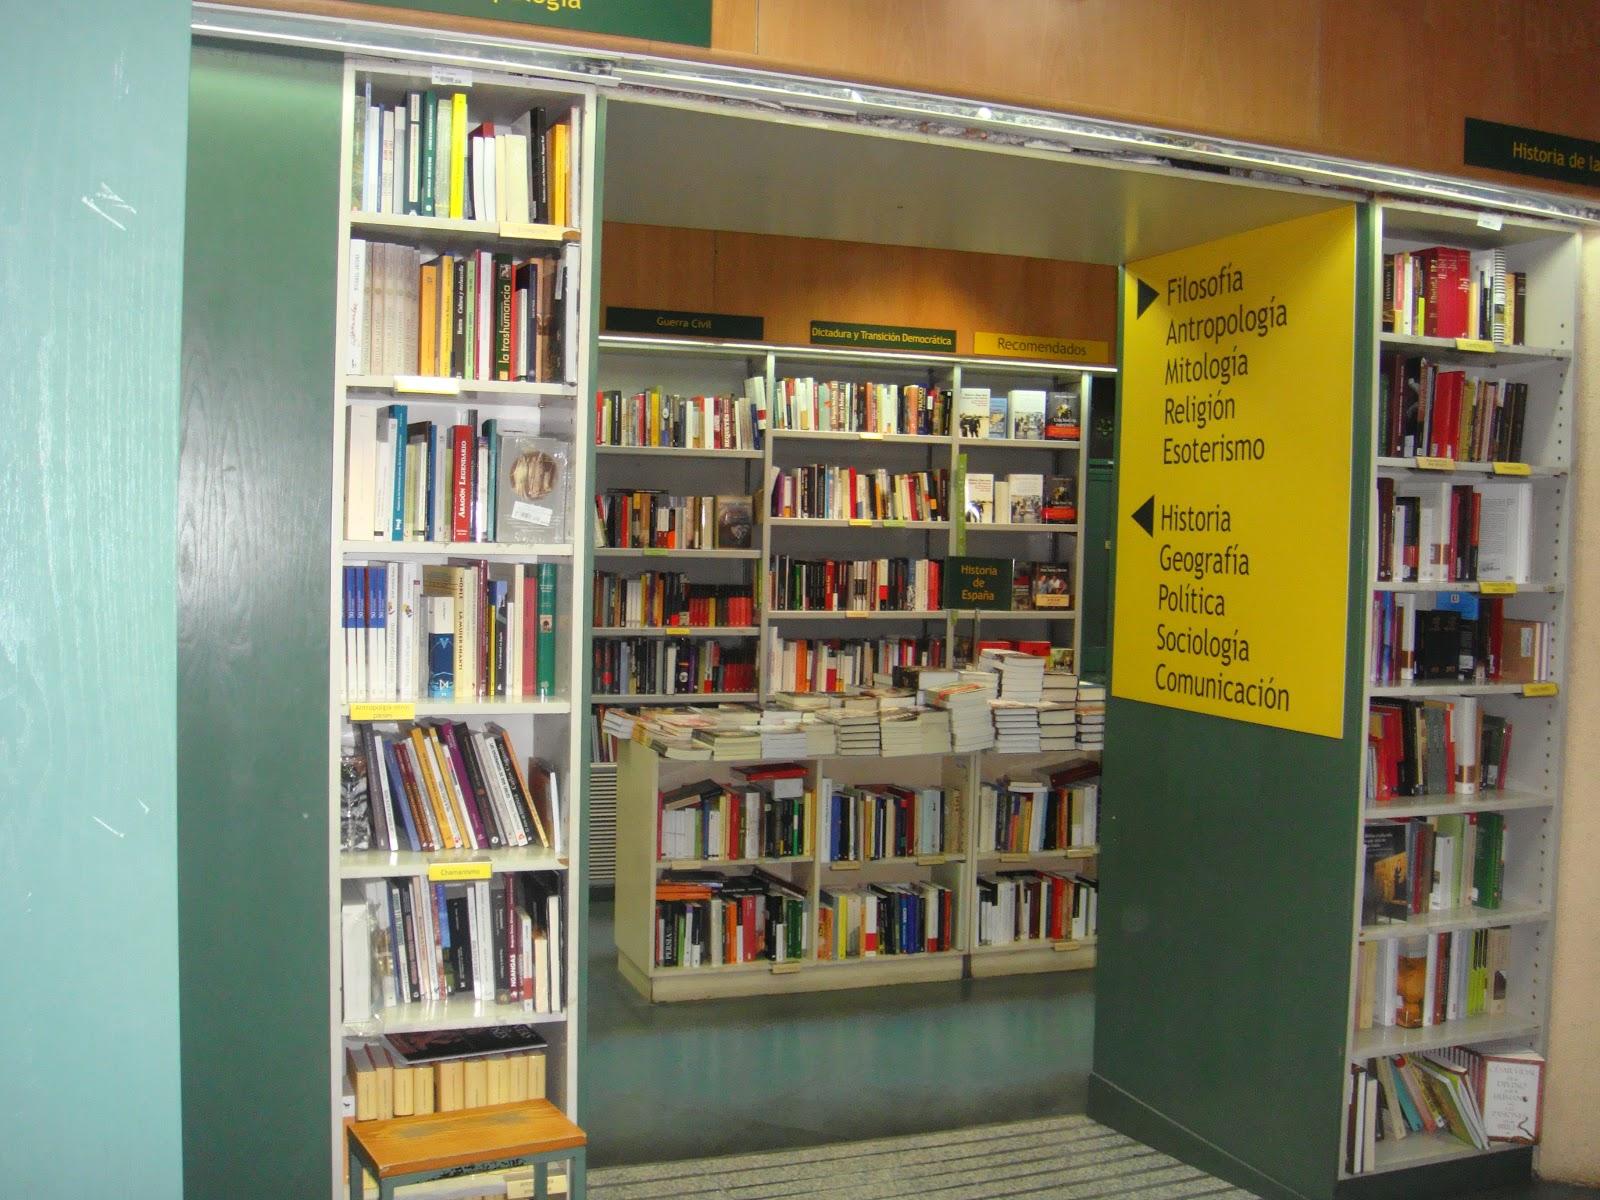 El mundo de carmen de compras entre libros - Libreria carmen ...